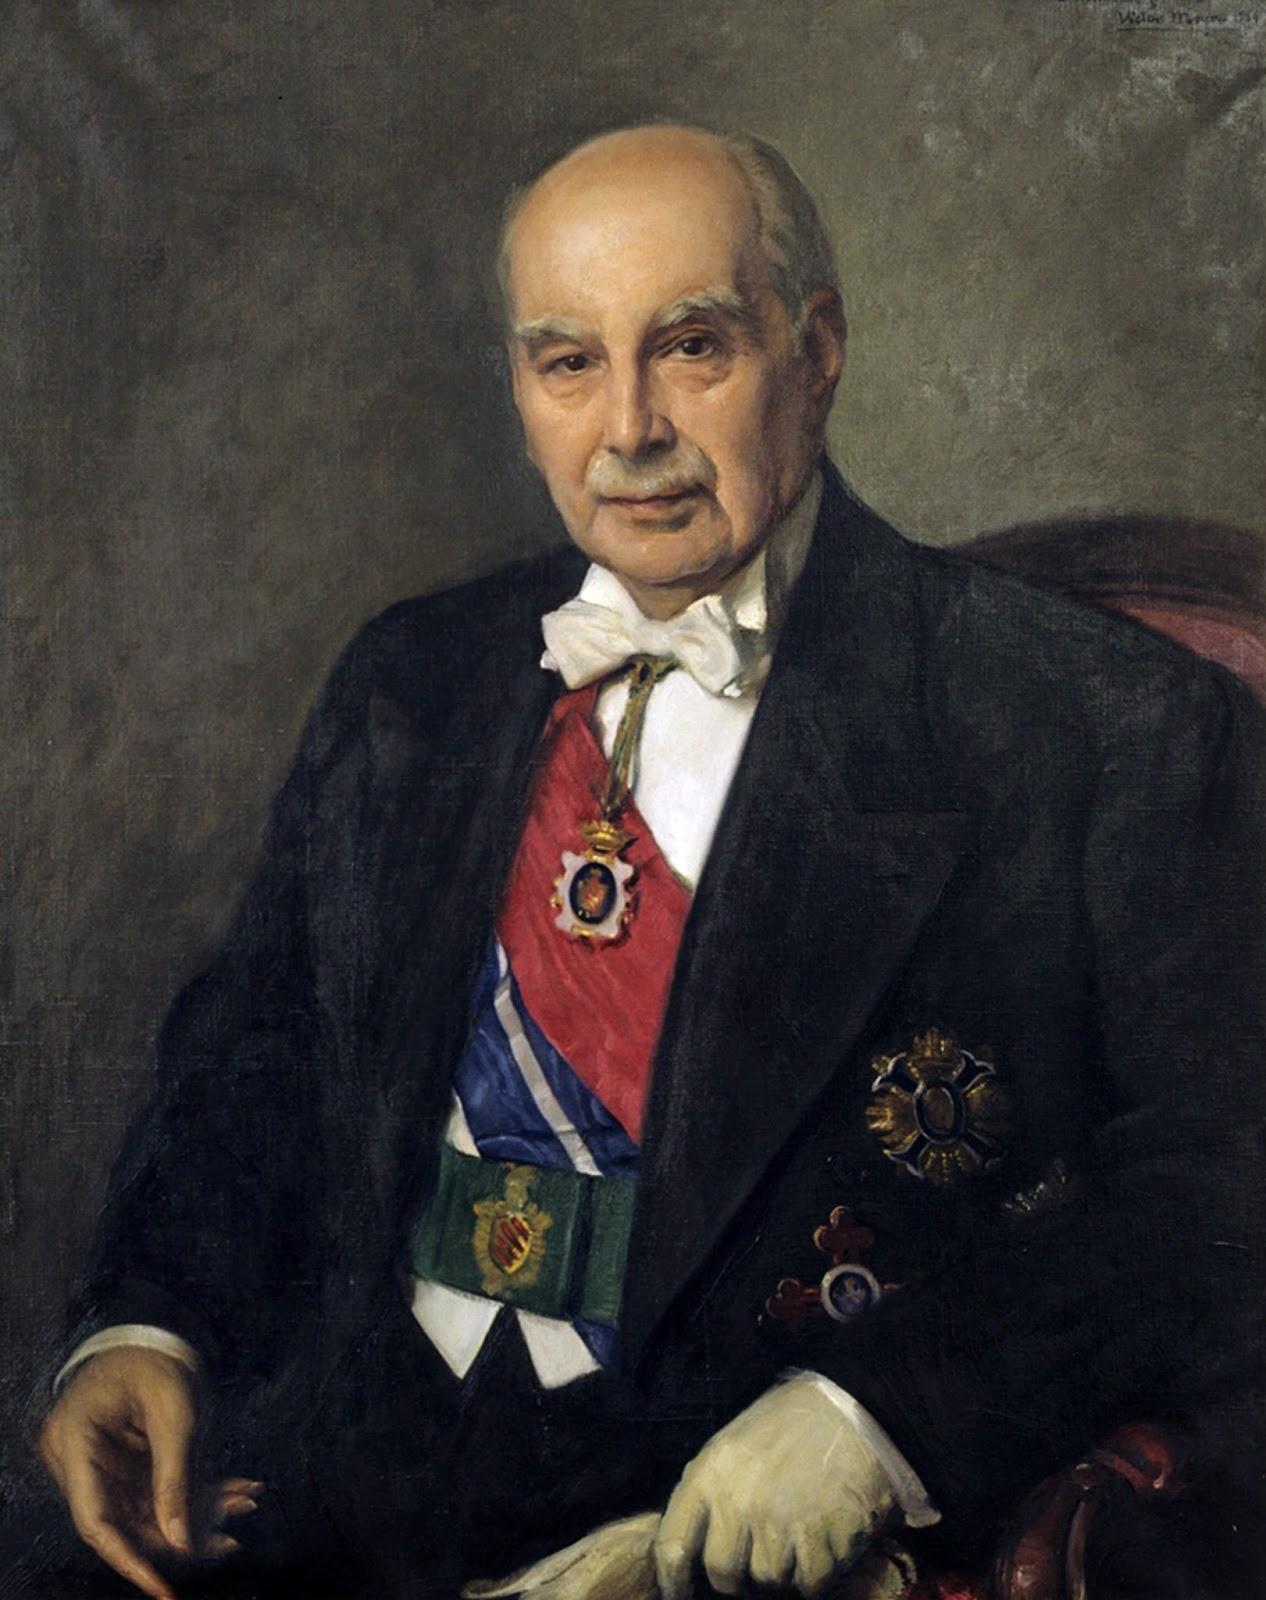 Retrato de González Martí